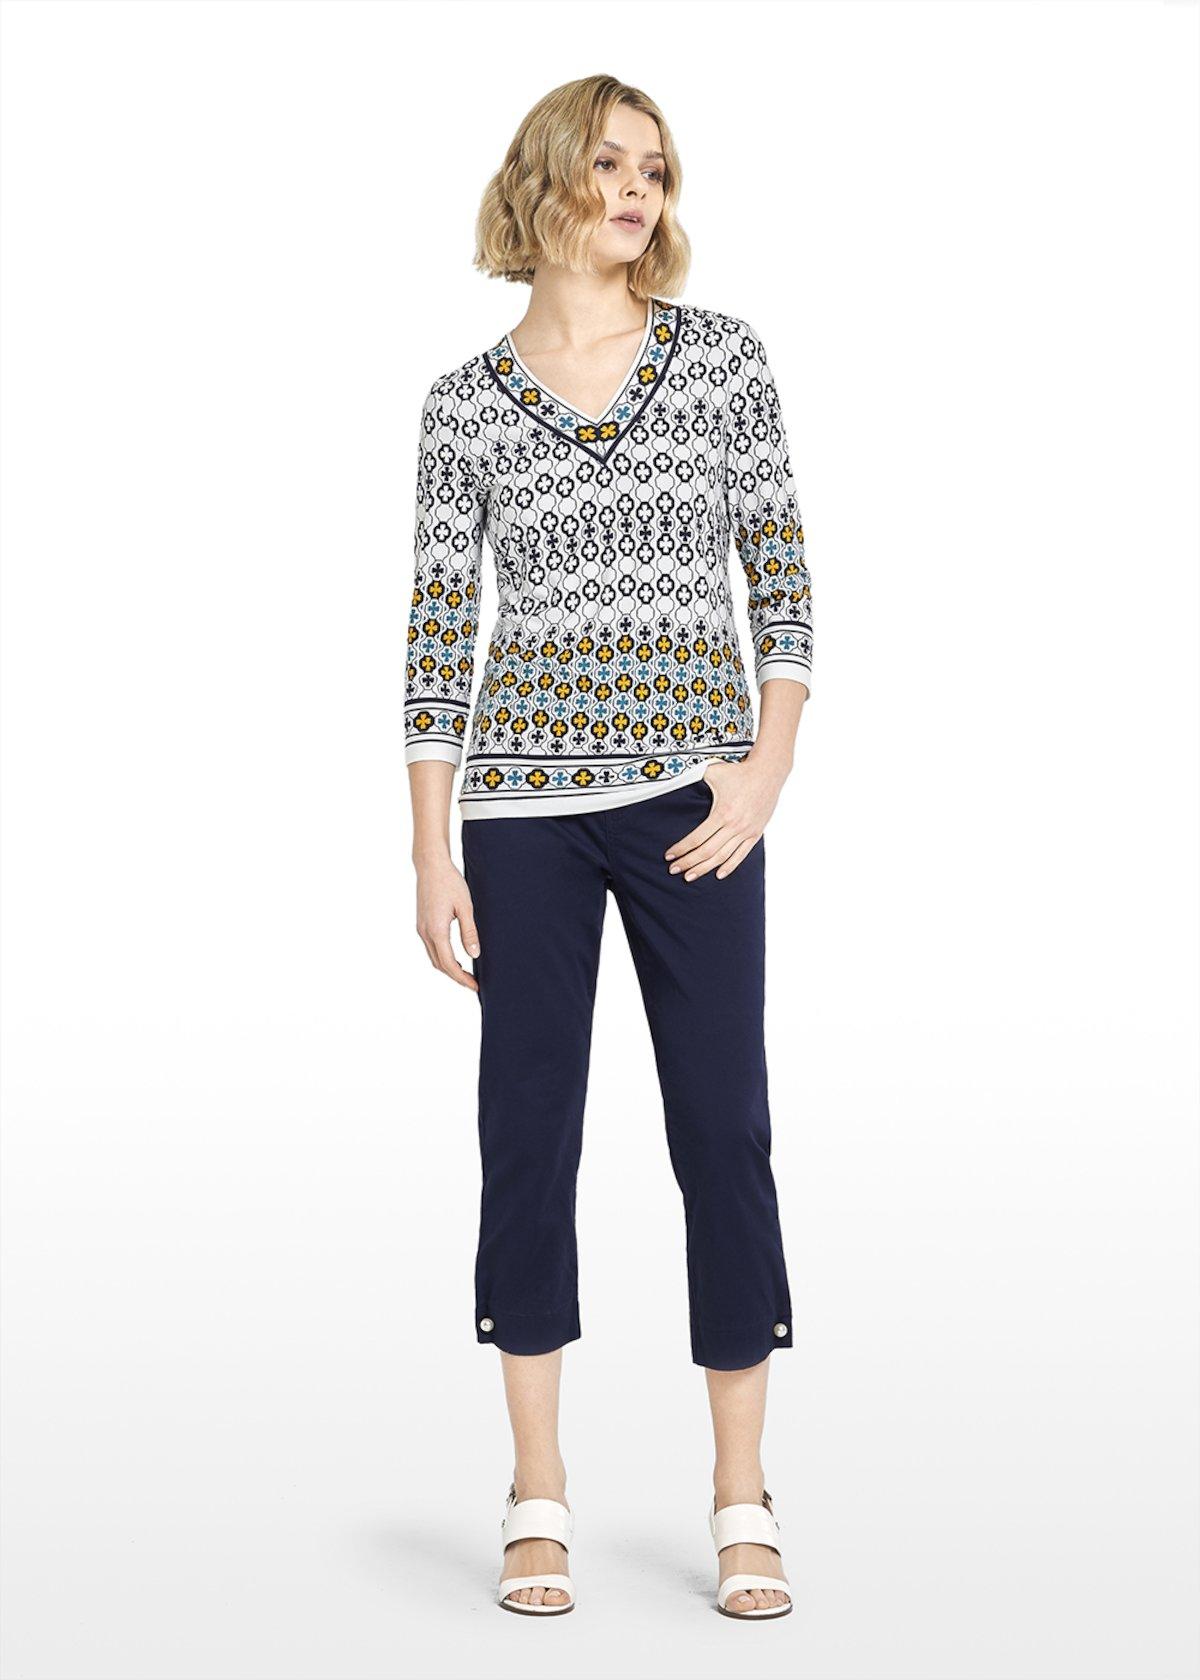 Mosaic pattern jersey Samel t-shirt - White / Blue Fantasia - Woman - Category image